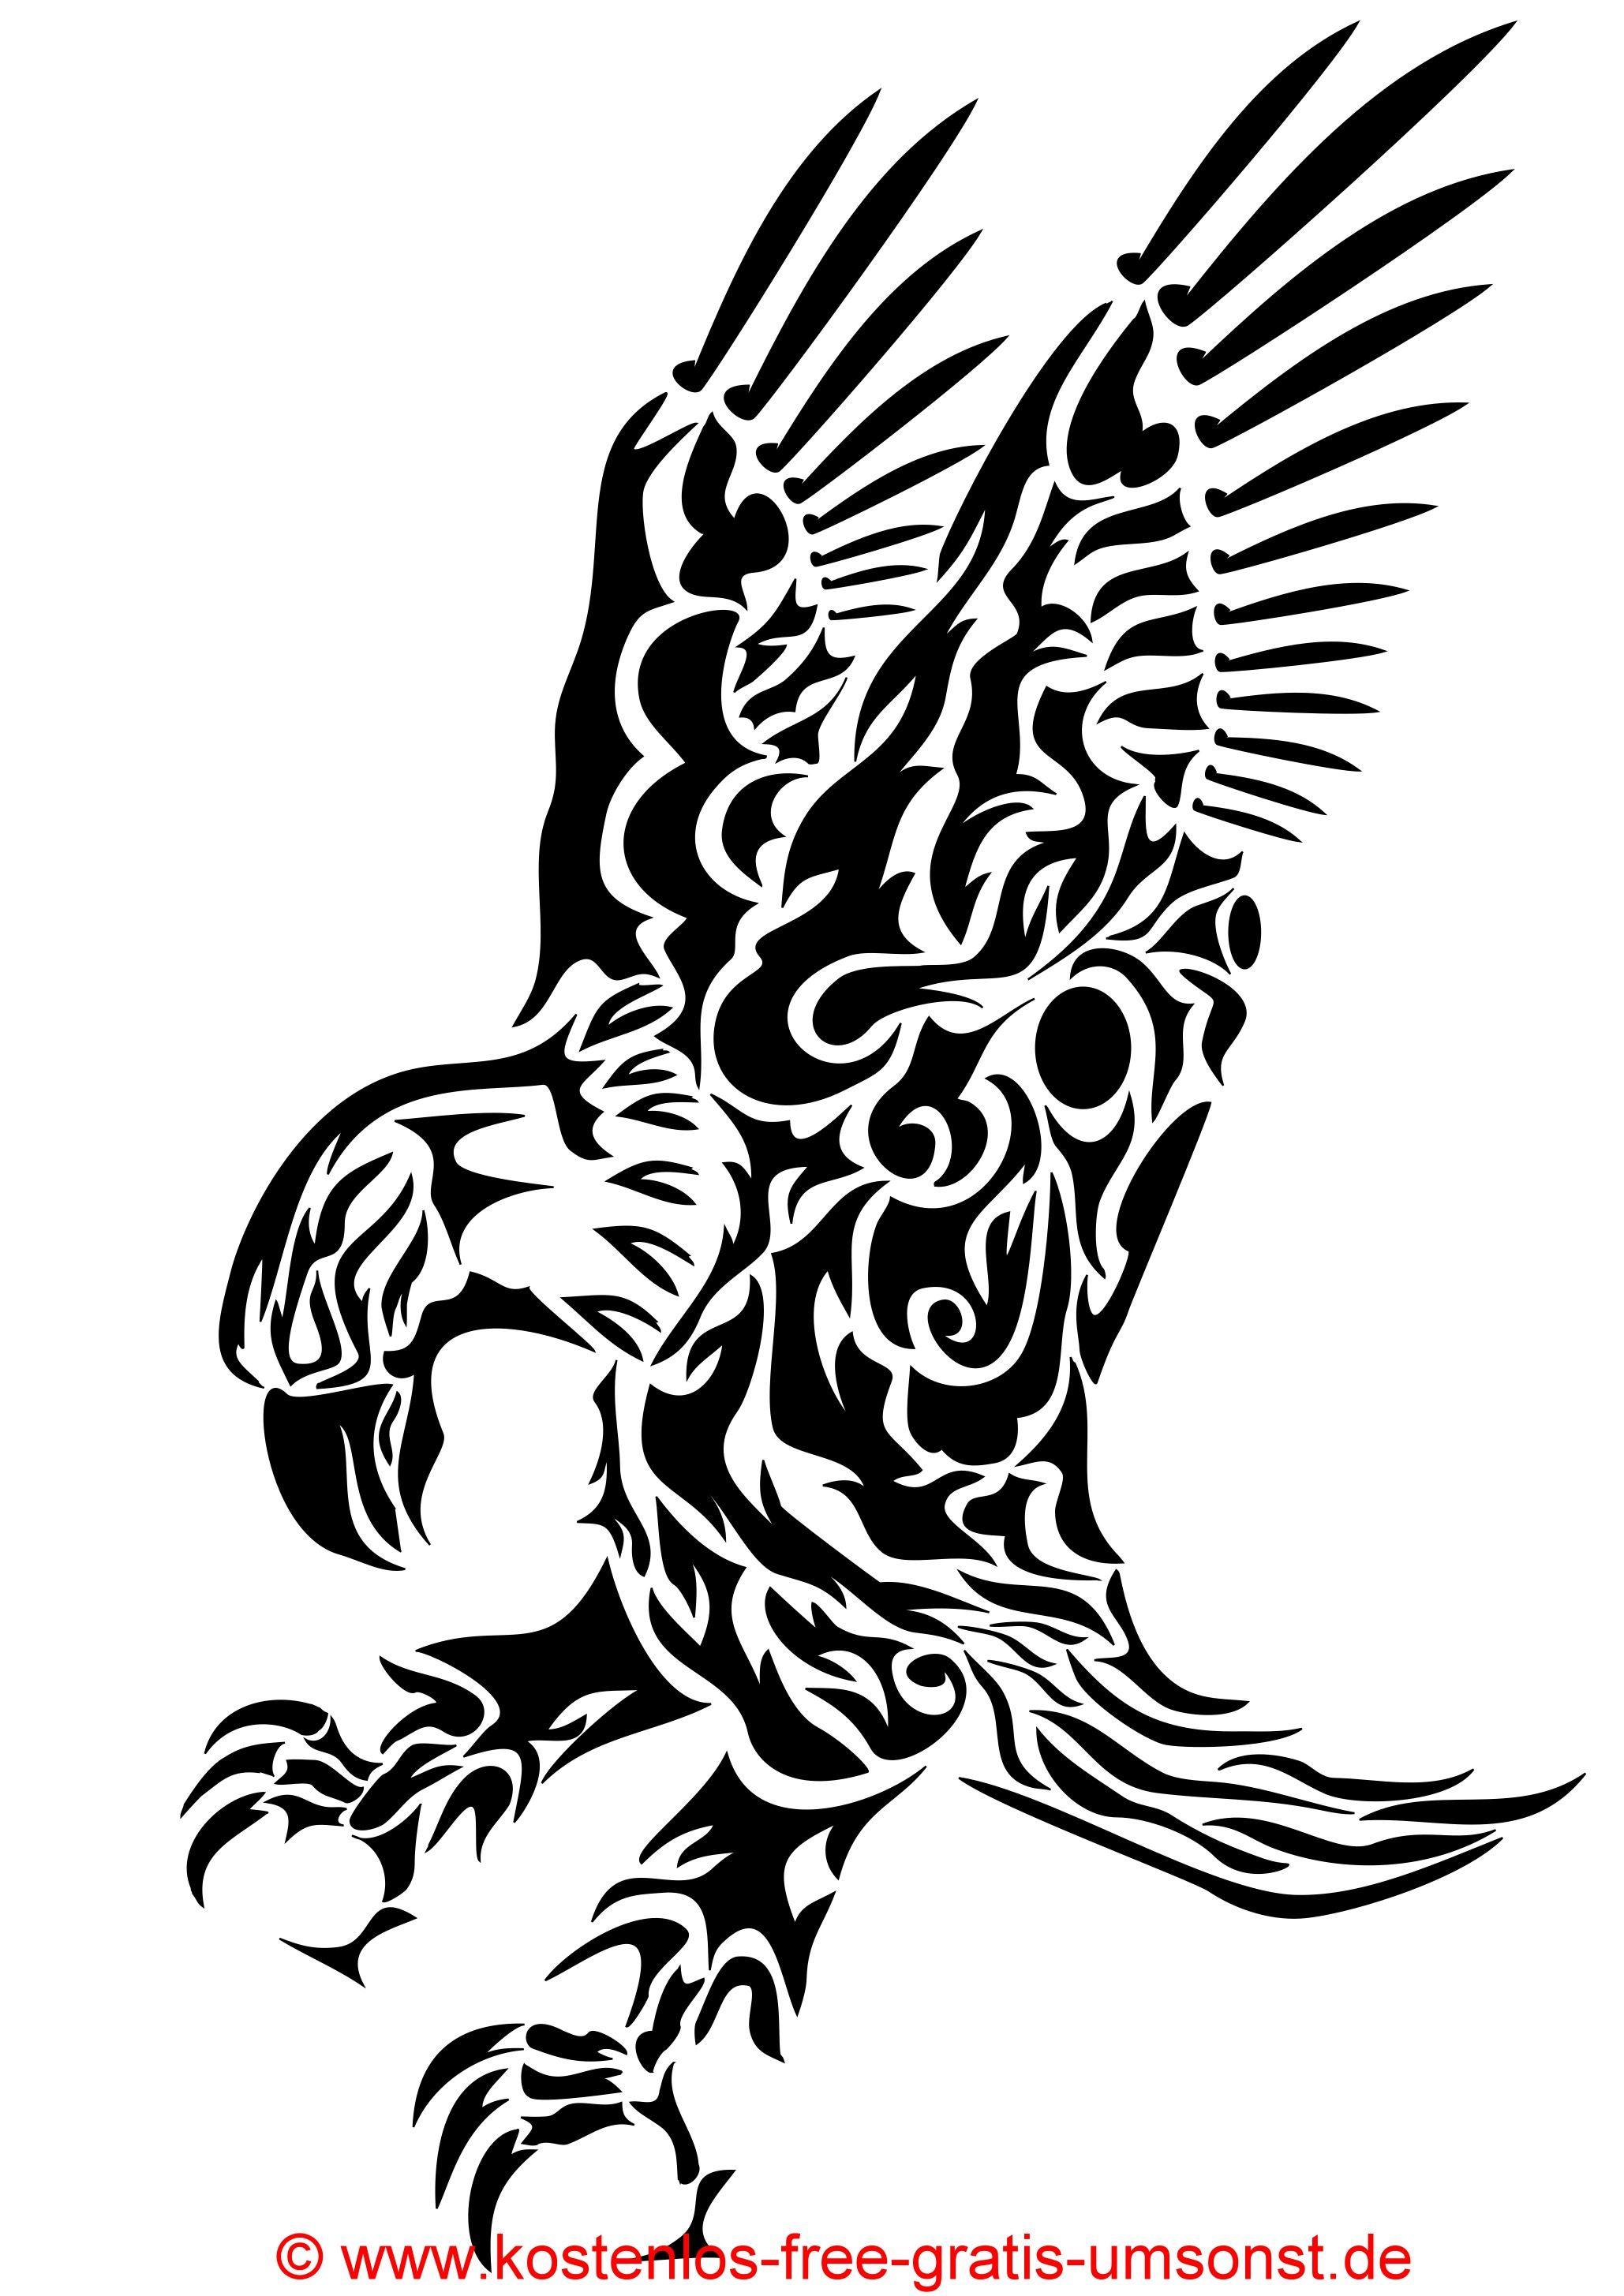 tiere tattoo bild vogel adler schwarze tattoovorlage black tattoopicture bird eagle tribal art. Black Bedroom Furniture Sets. Home Design Ideas